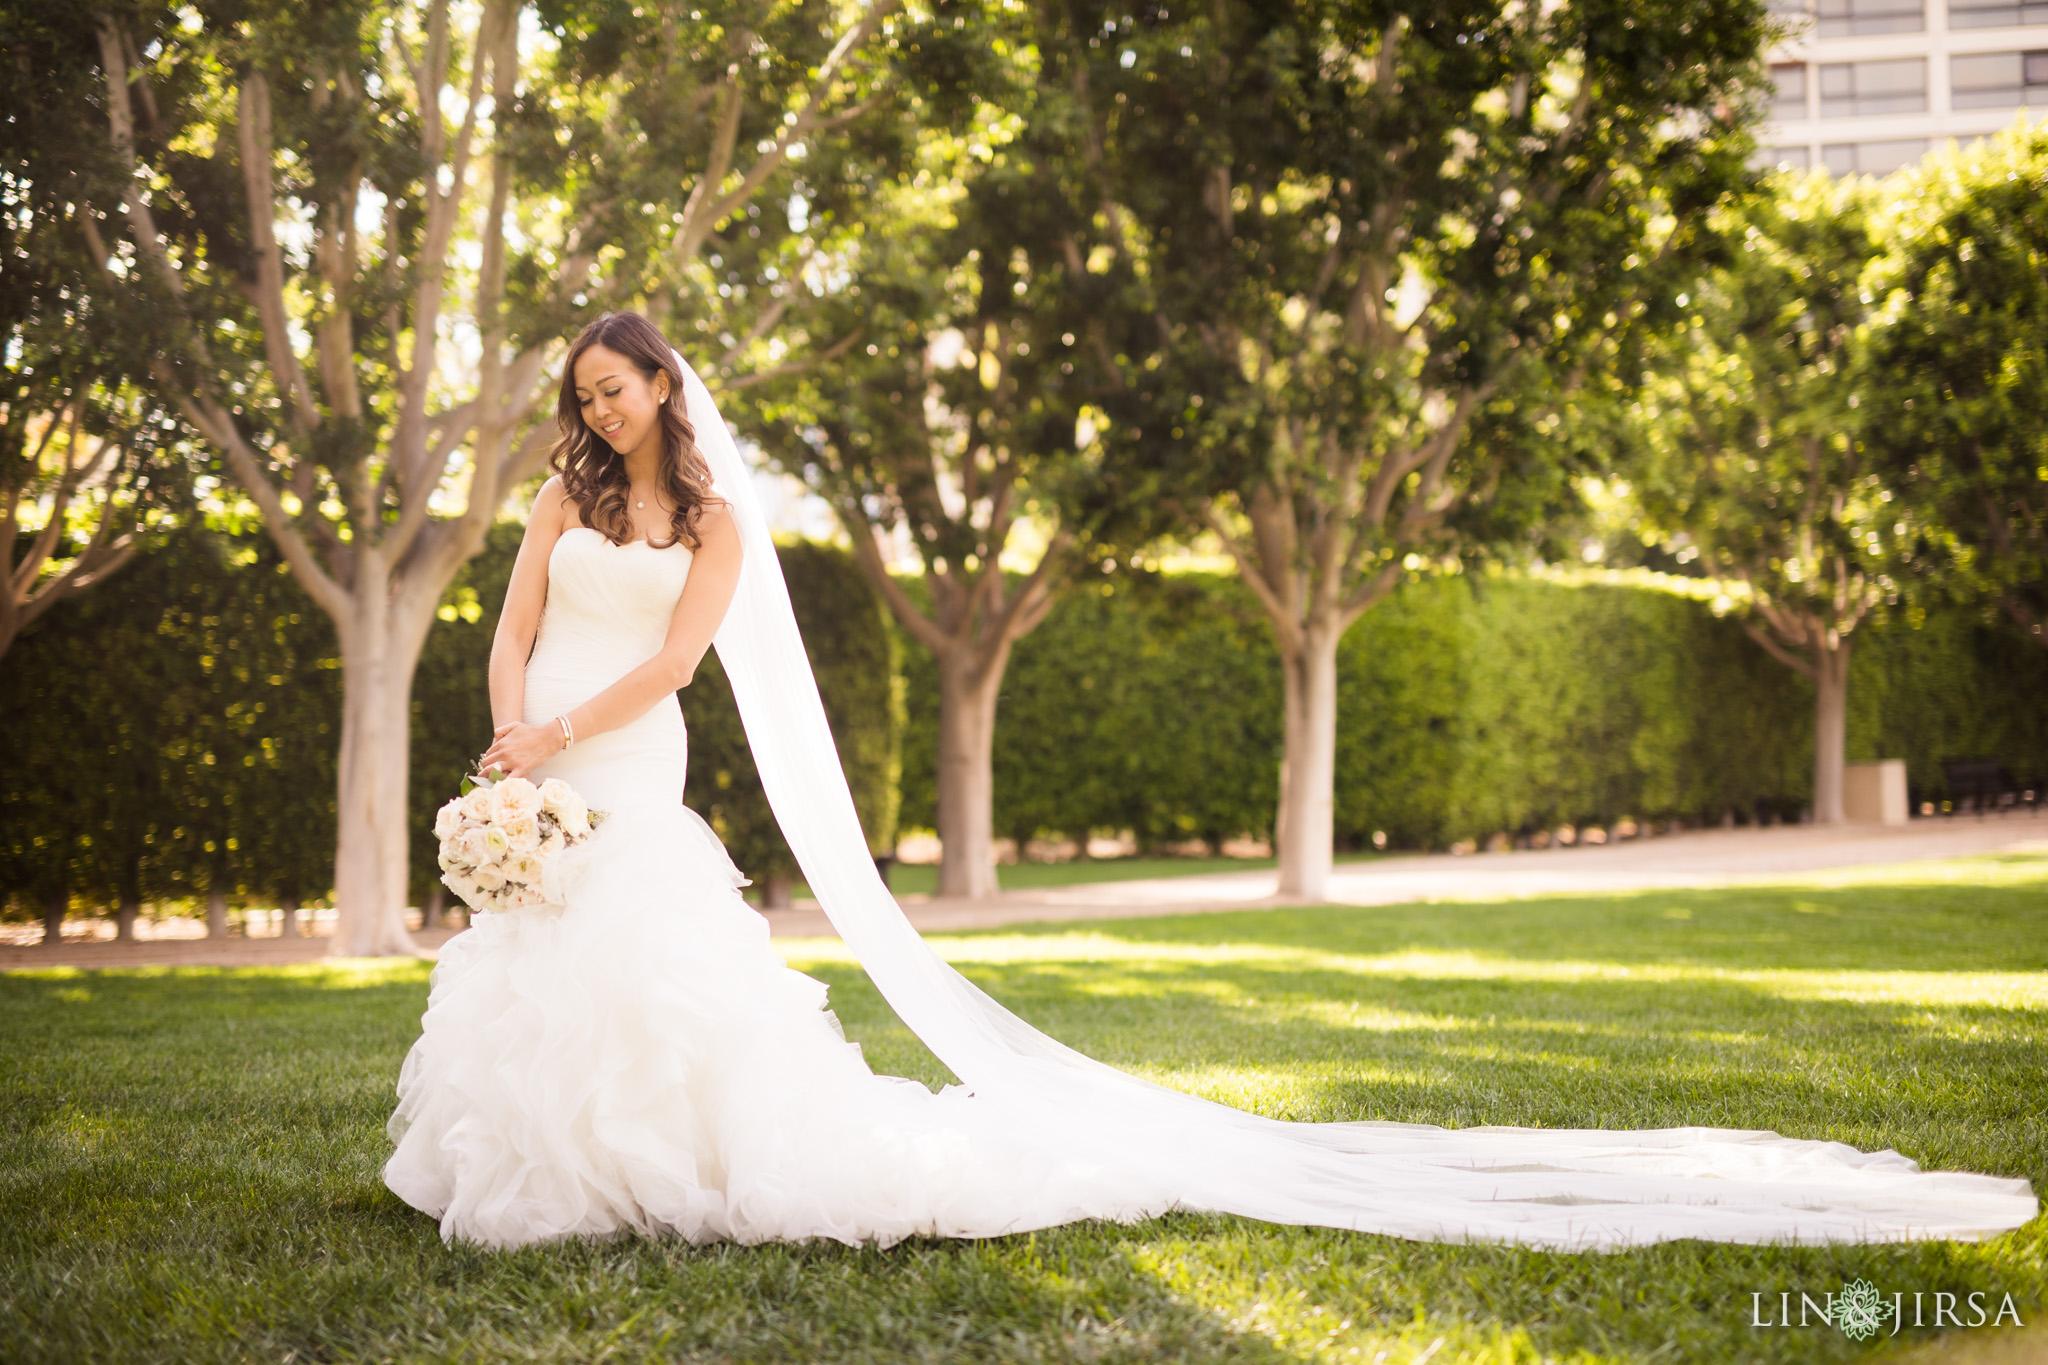 01 hotel irvine orange county bride wedding photography